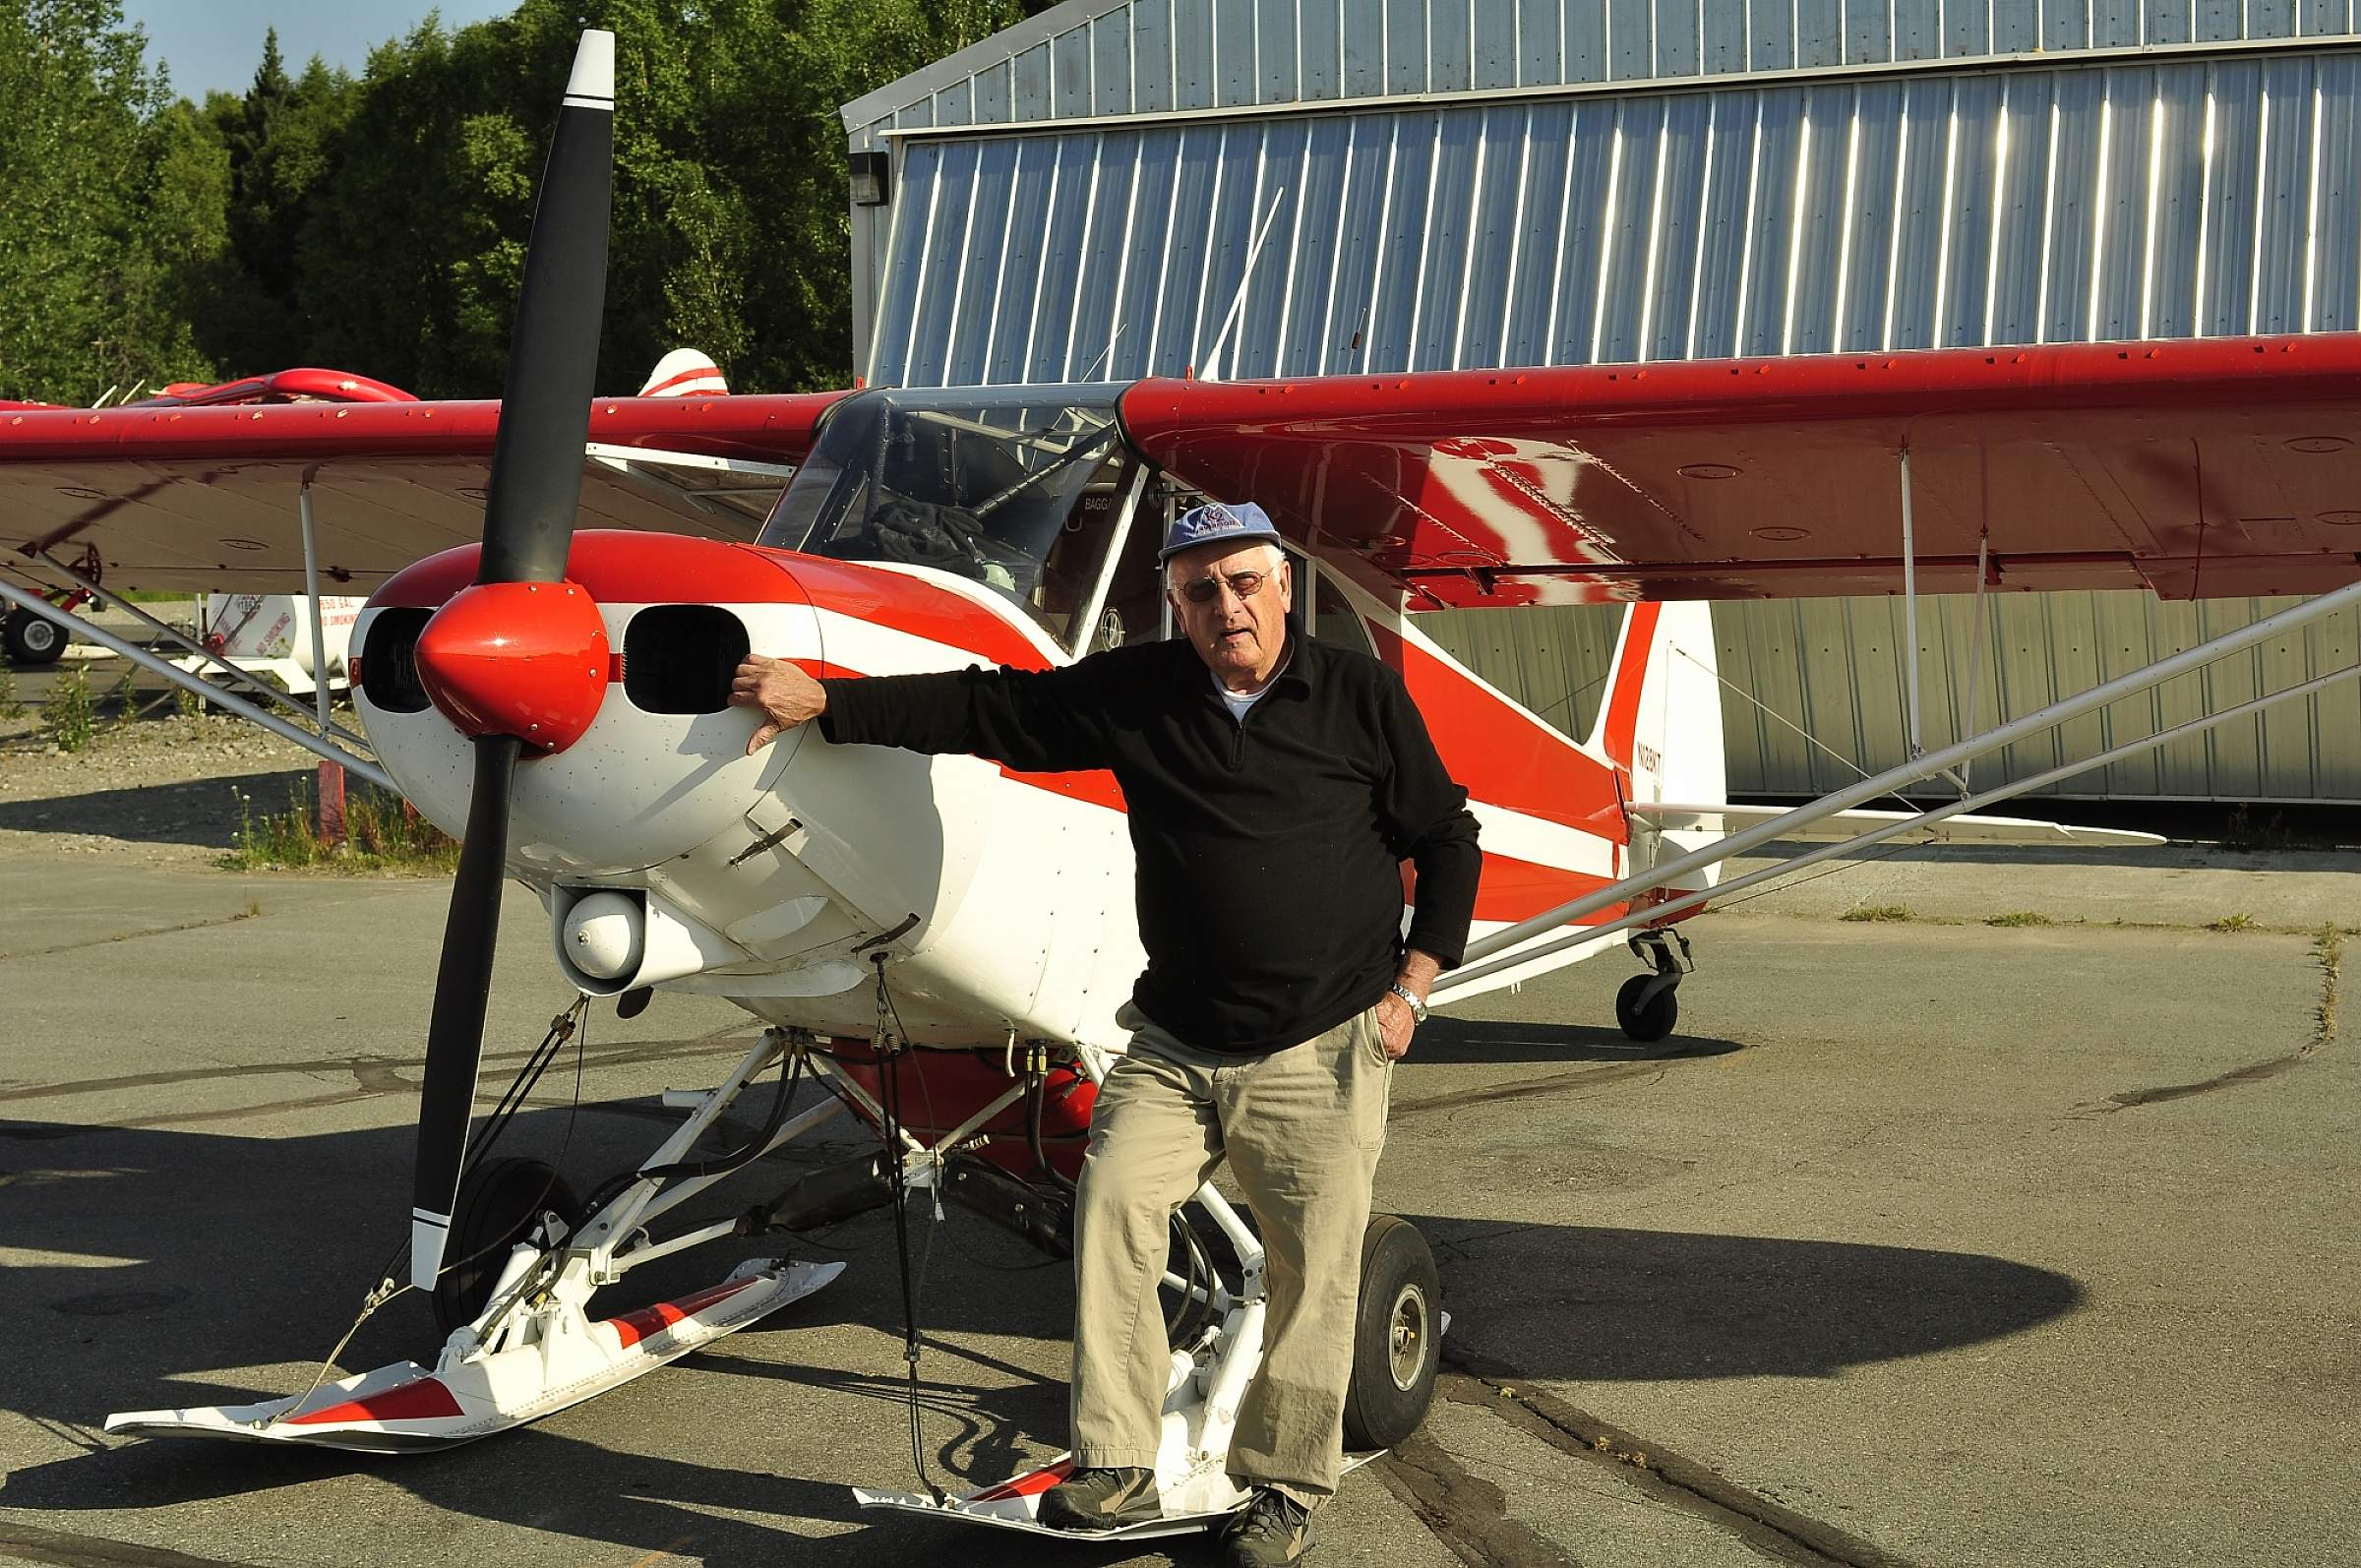 Jim Okonek K2 Aviation David Parkhurst DSC5444